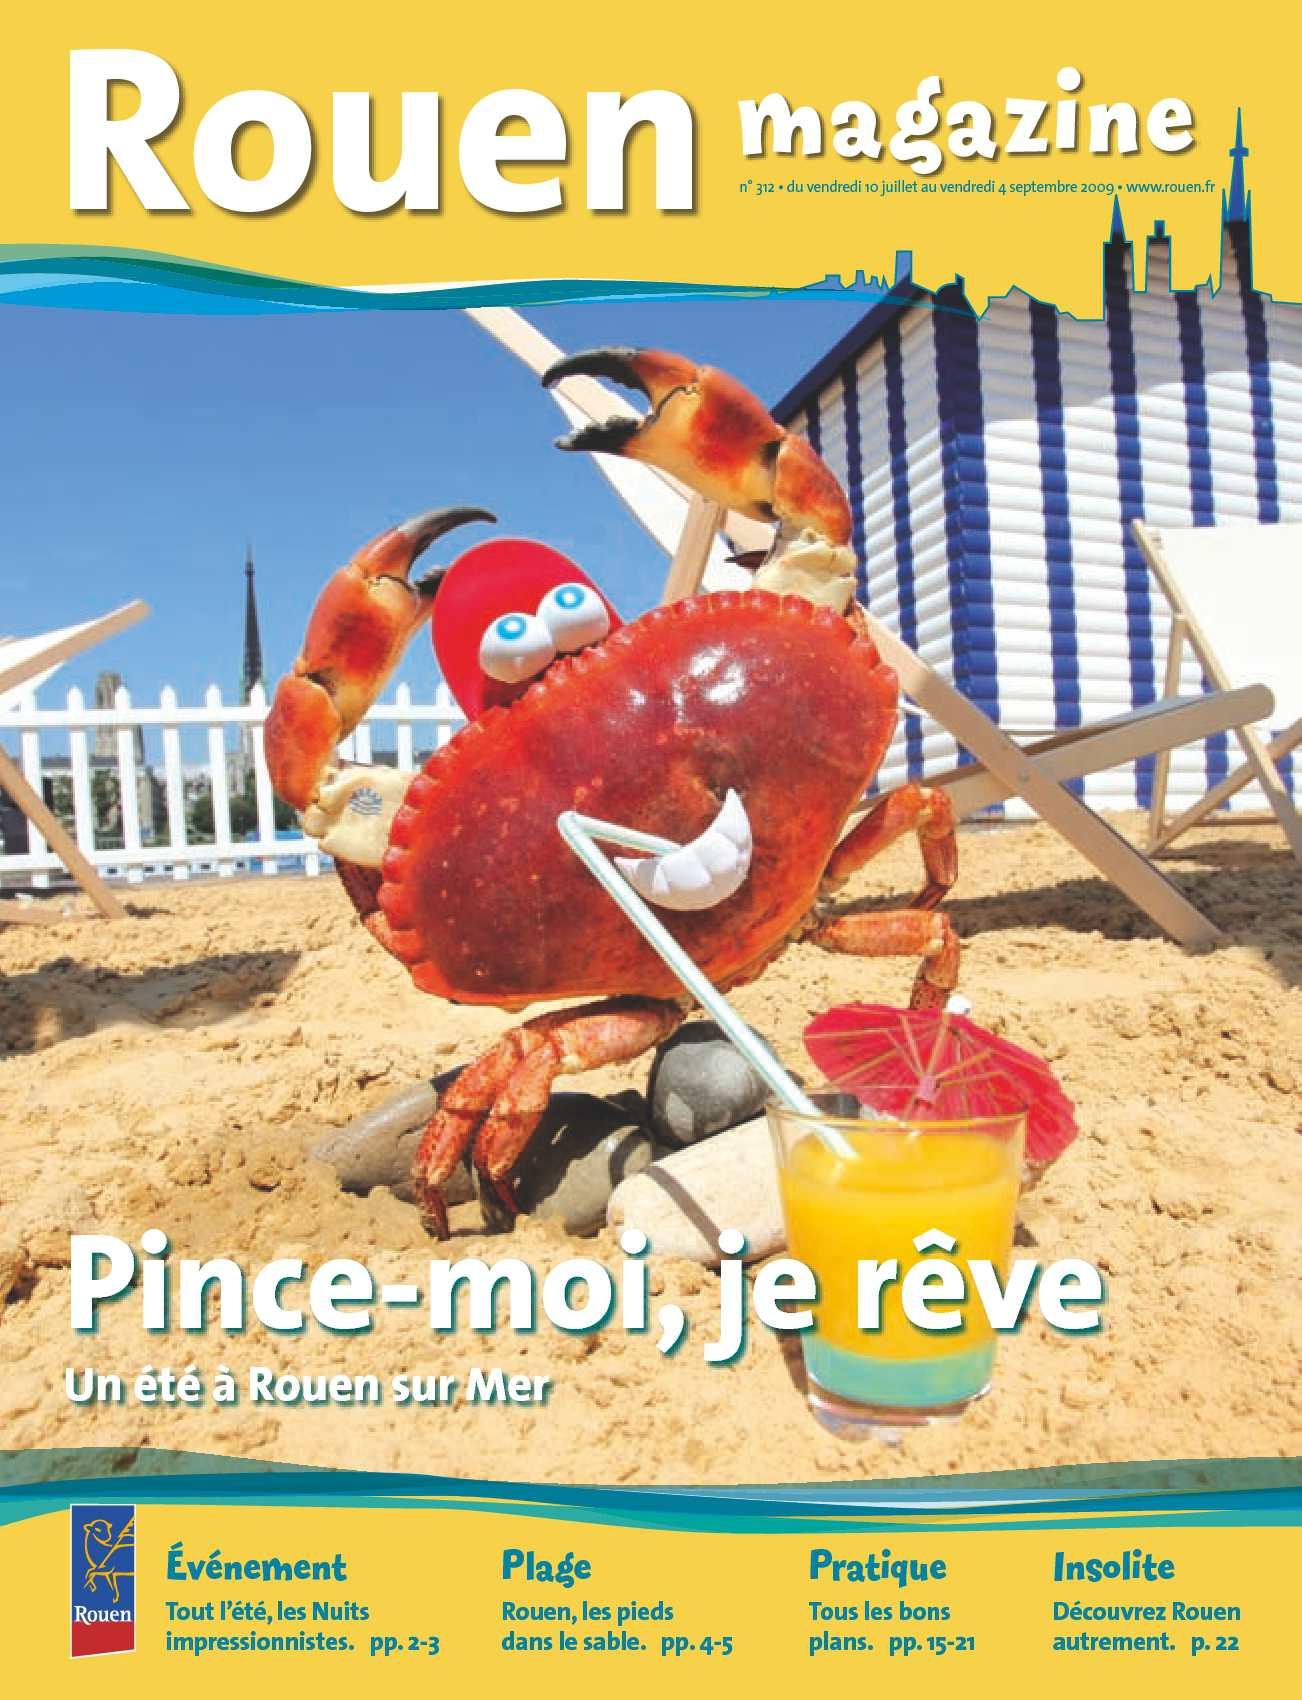 Les 4 Pieds Rouen calaméo - rouen magazine 312